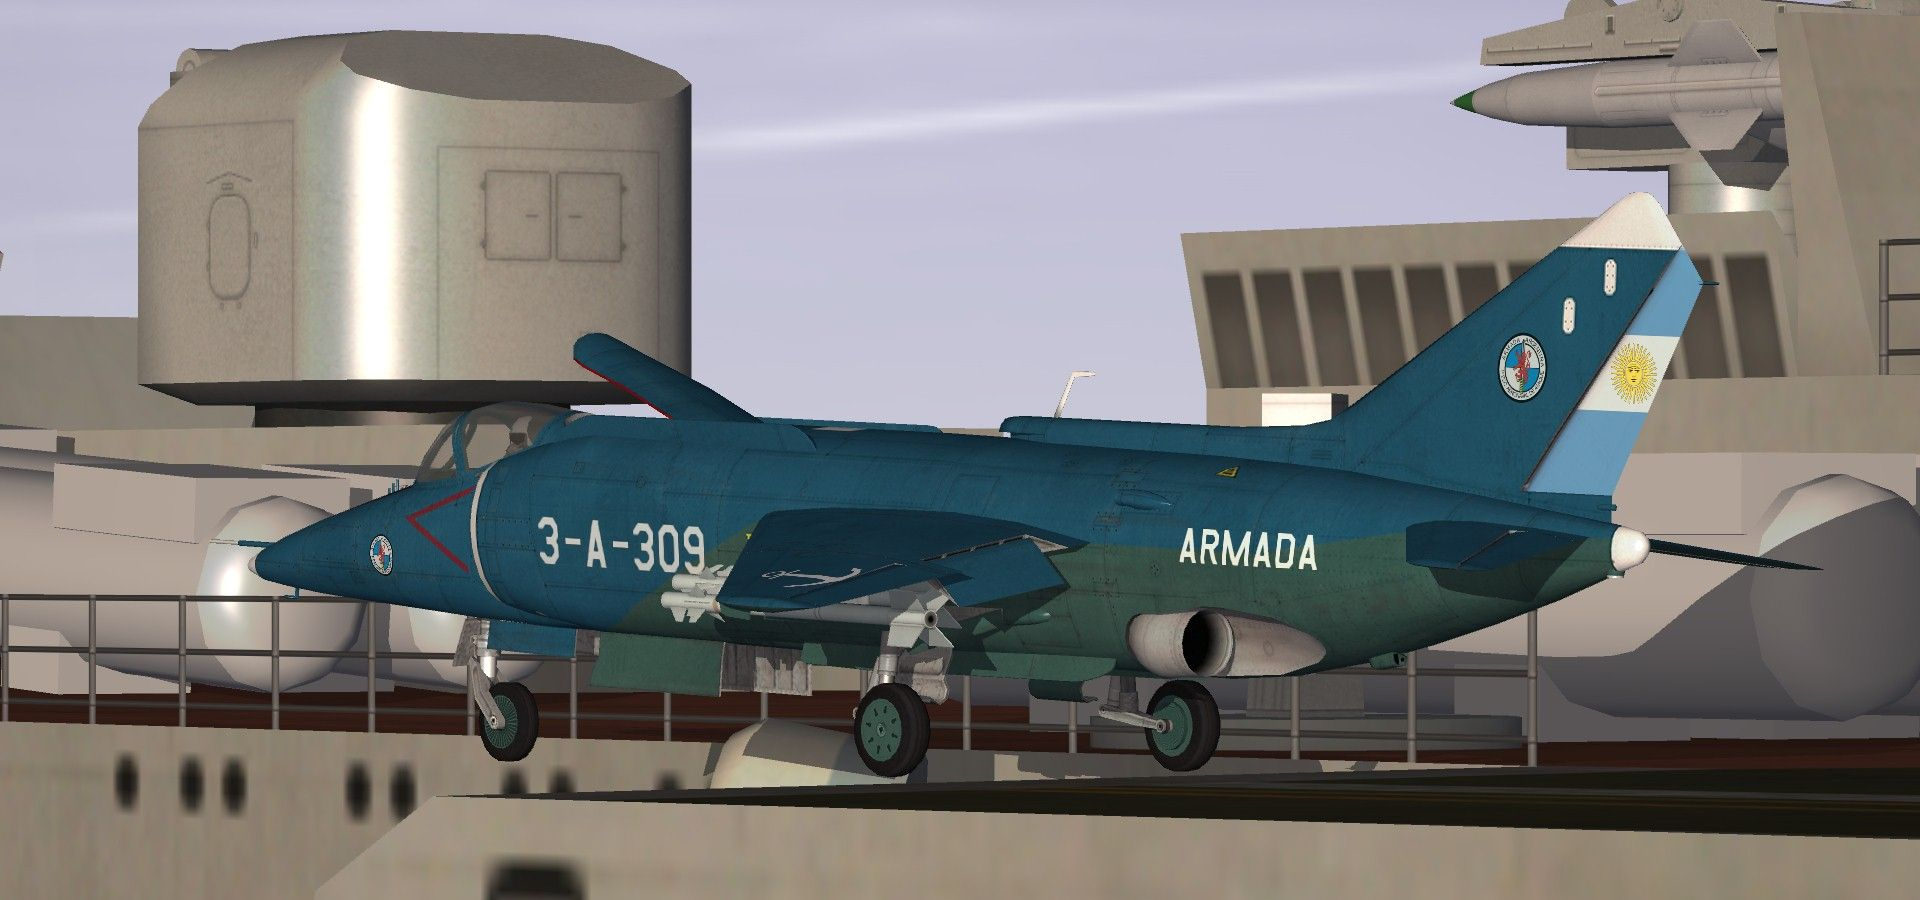 COANYAK-38FORGER02_zps032aed08.jpg